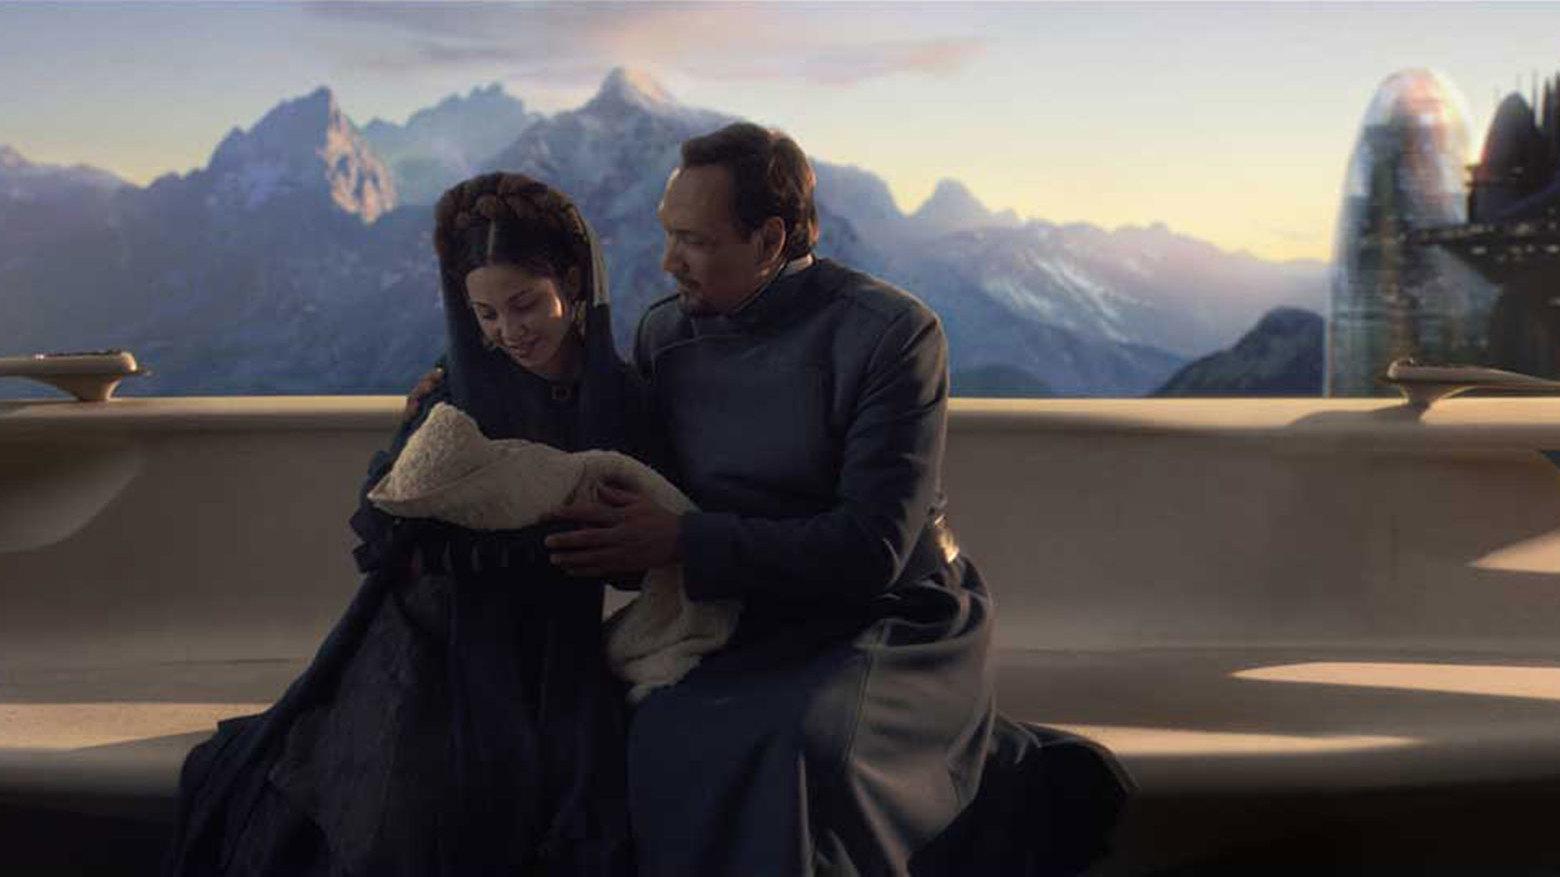 Princess Leia Organa Biography